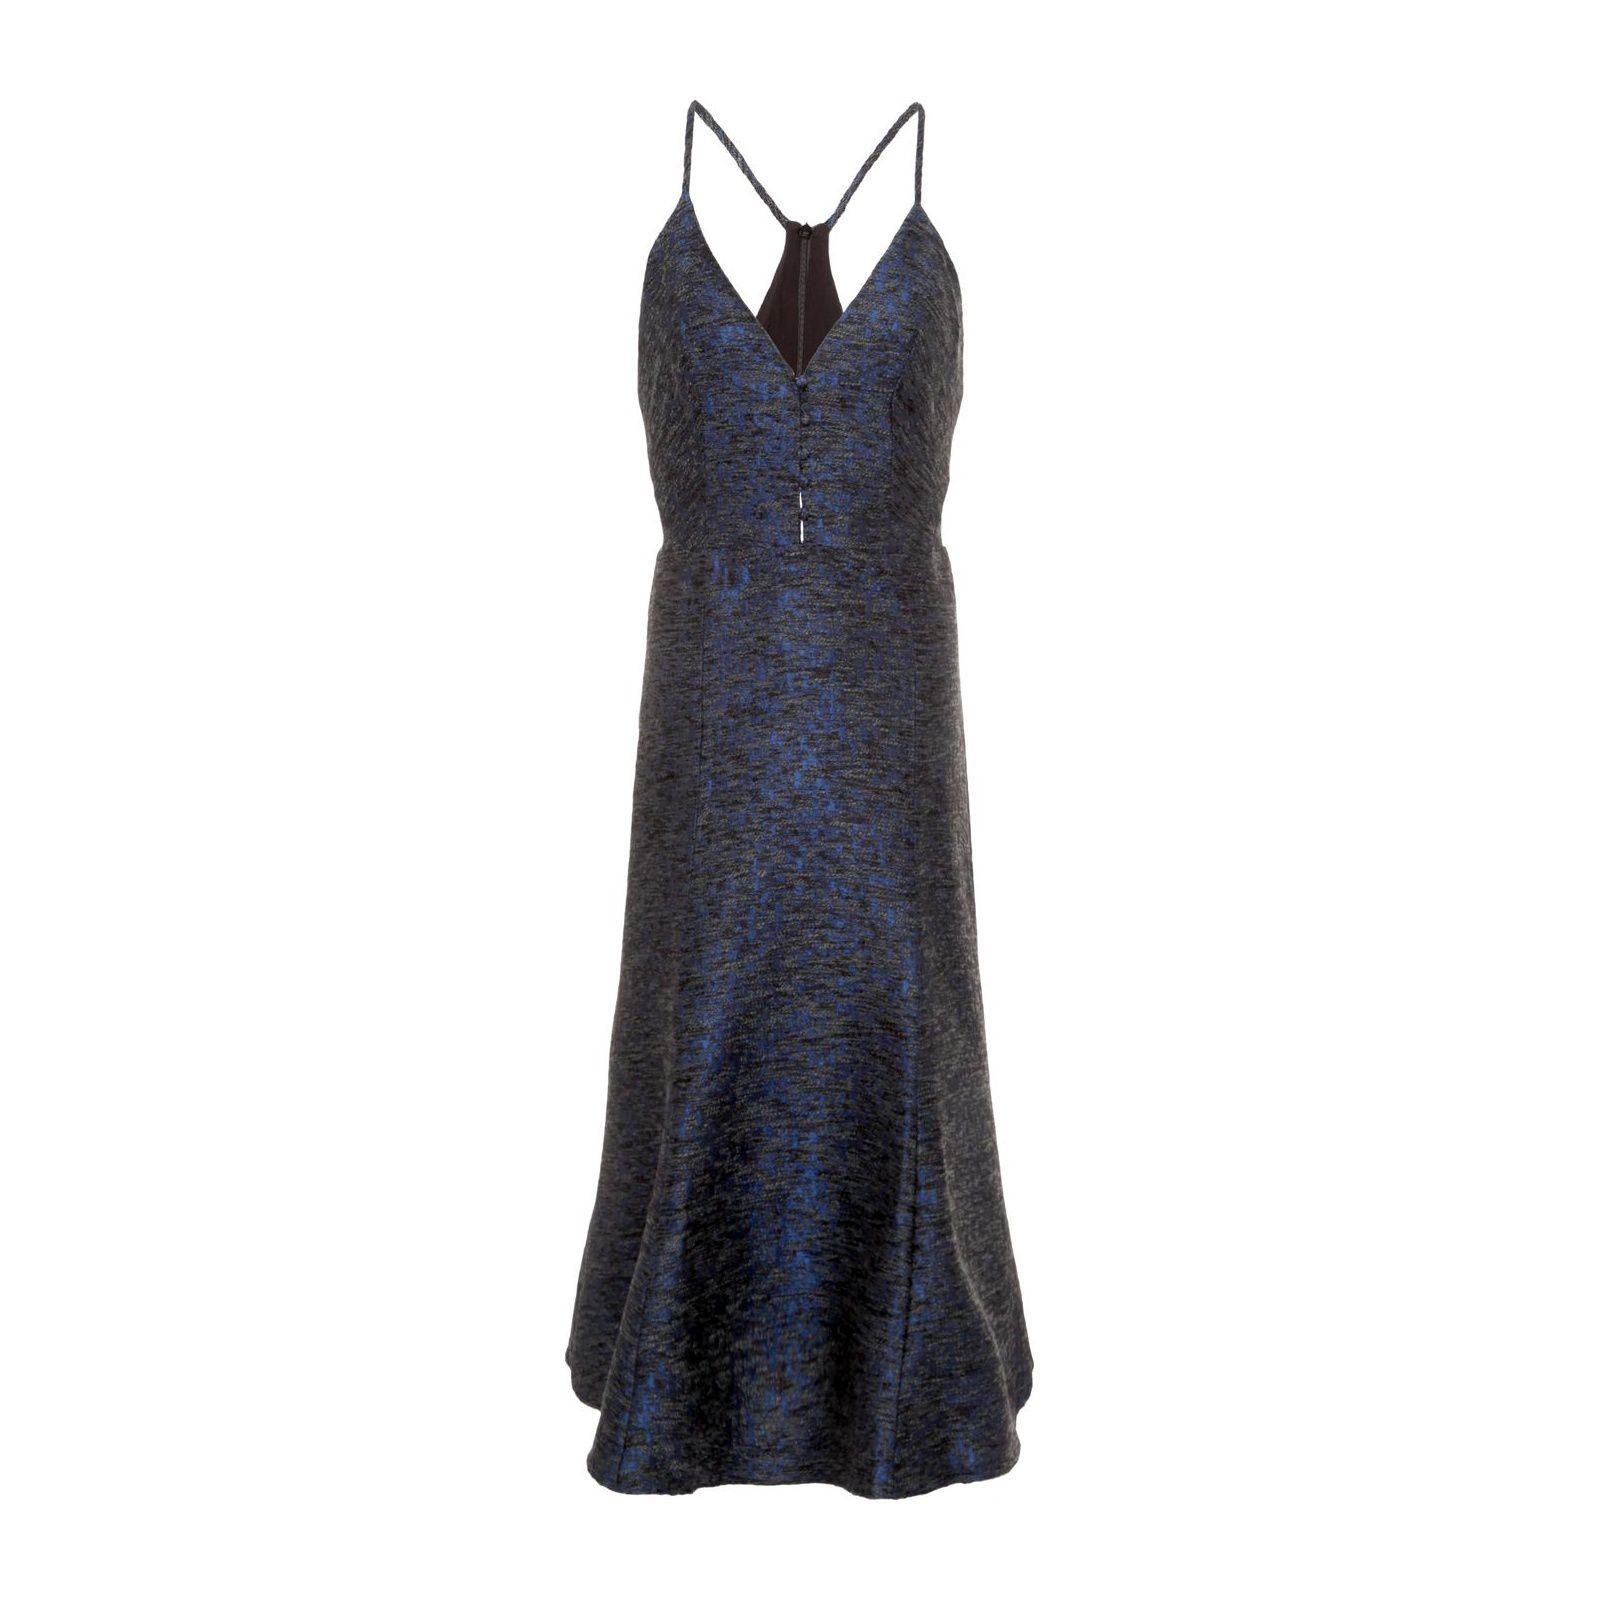 Vestido Jacquard Assimétrico Mídi - Azul